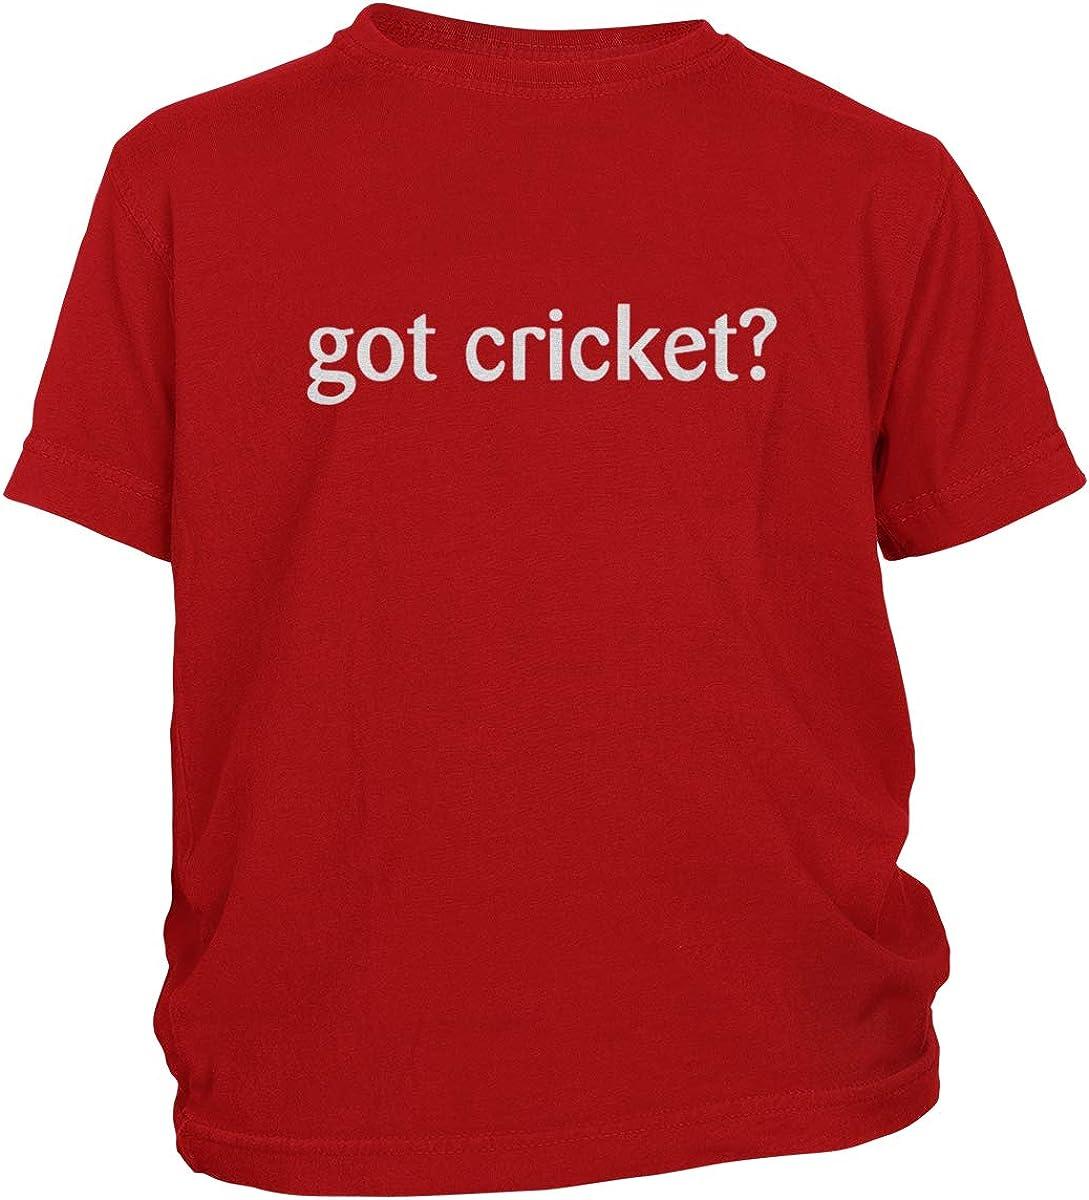 shirtloco Boys Got Cricket Youth T-Shirt